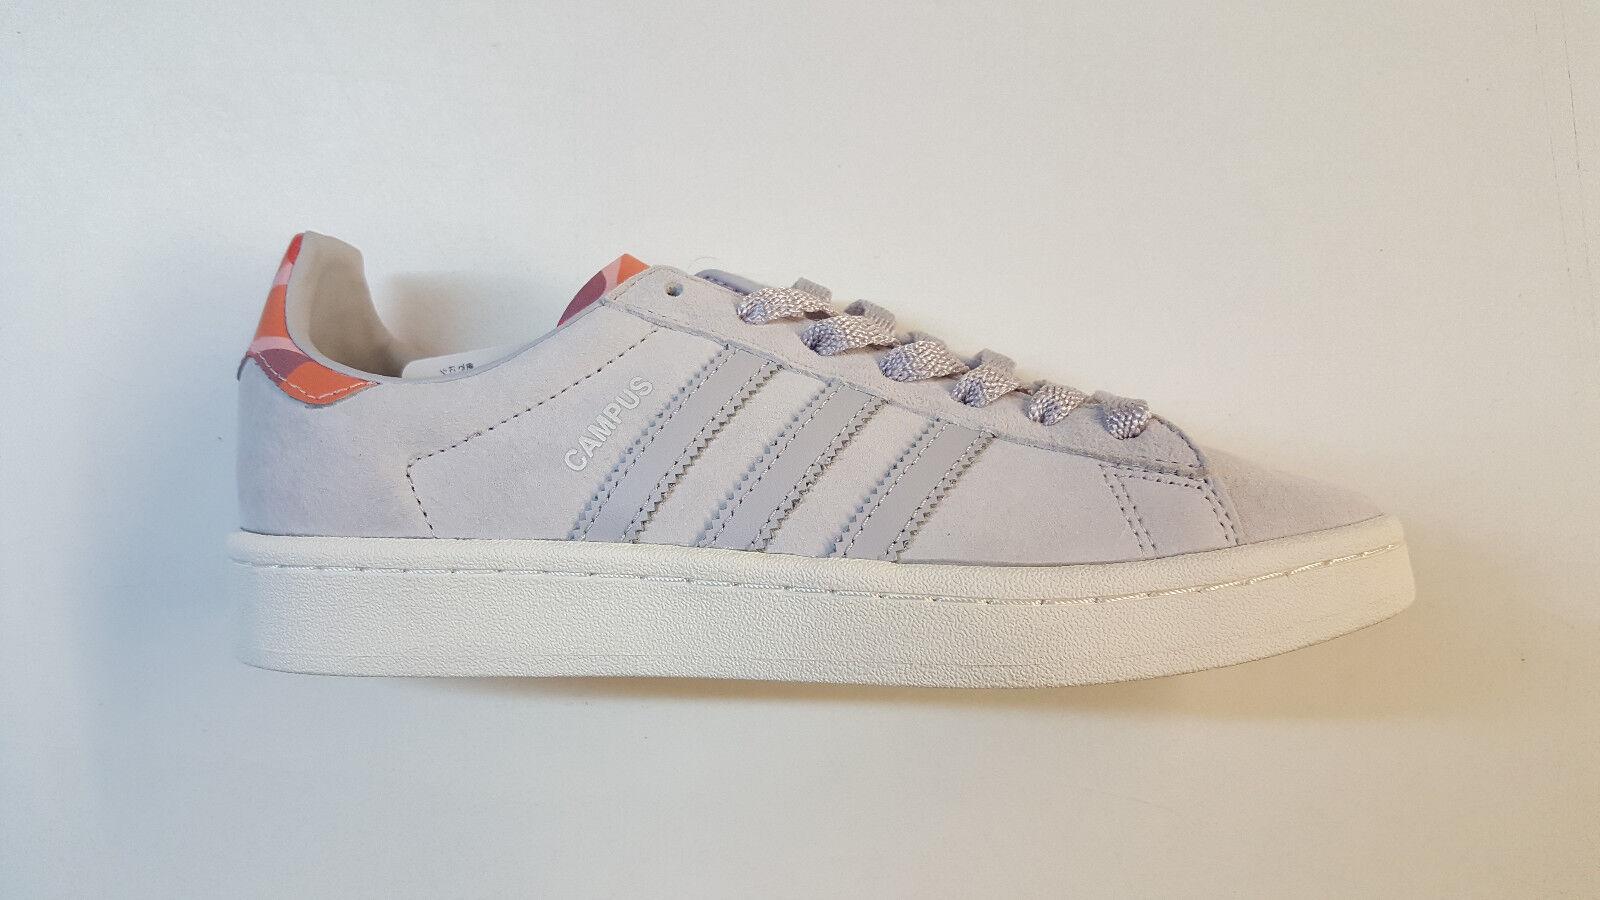 Adidas originali campus grigio chiaro sunglow rosa bb0078 1801-48 nuove Uomo scarpe nuove 1801-48 75ff09